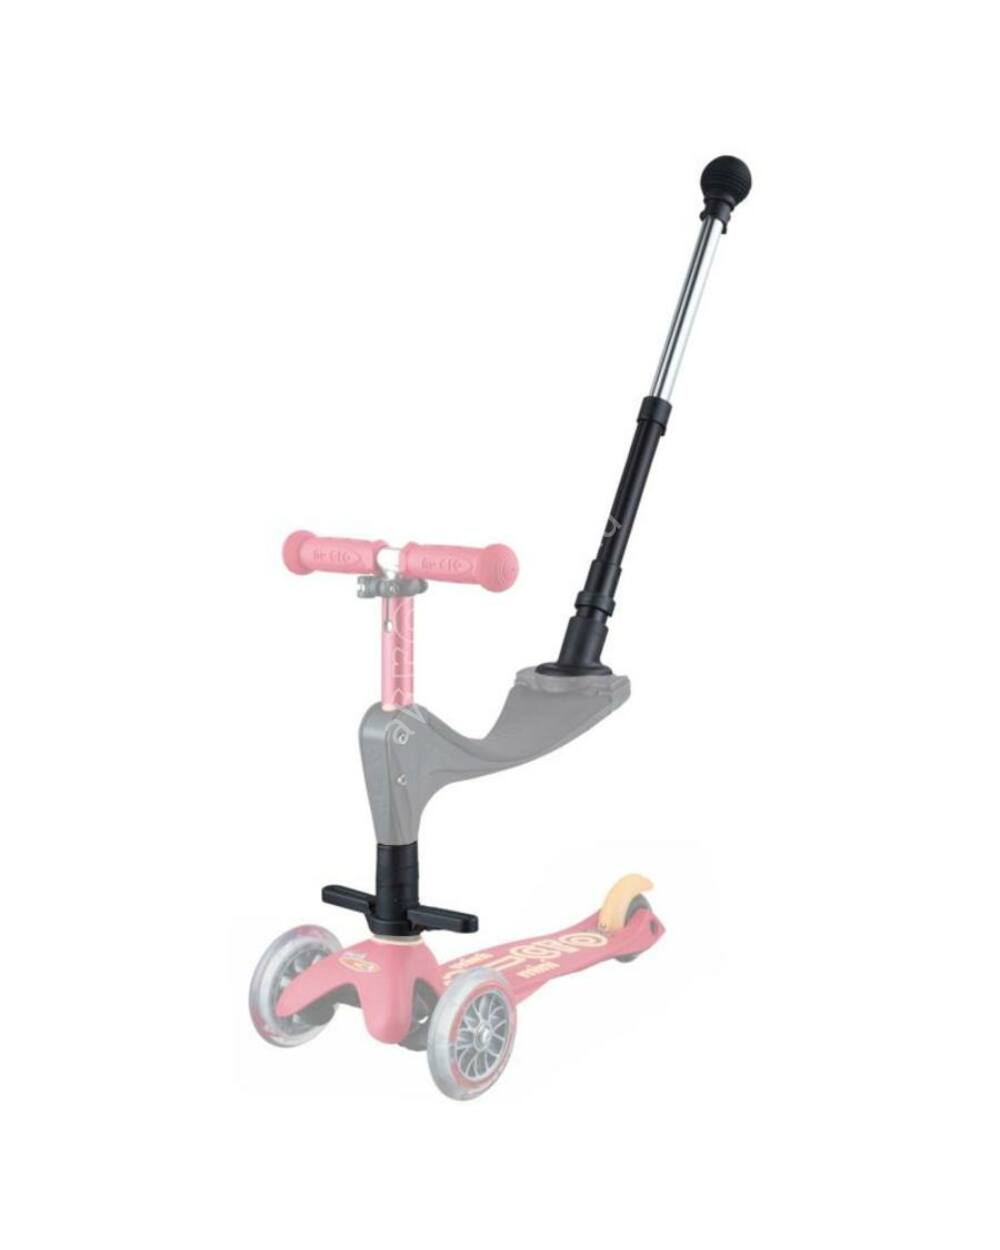 Tologató rúd 3in1 Mini Micro rollerhez